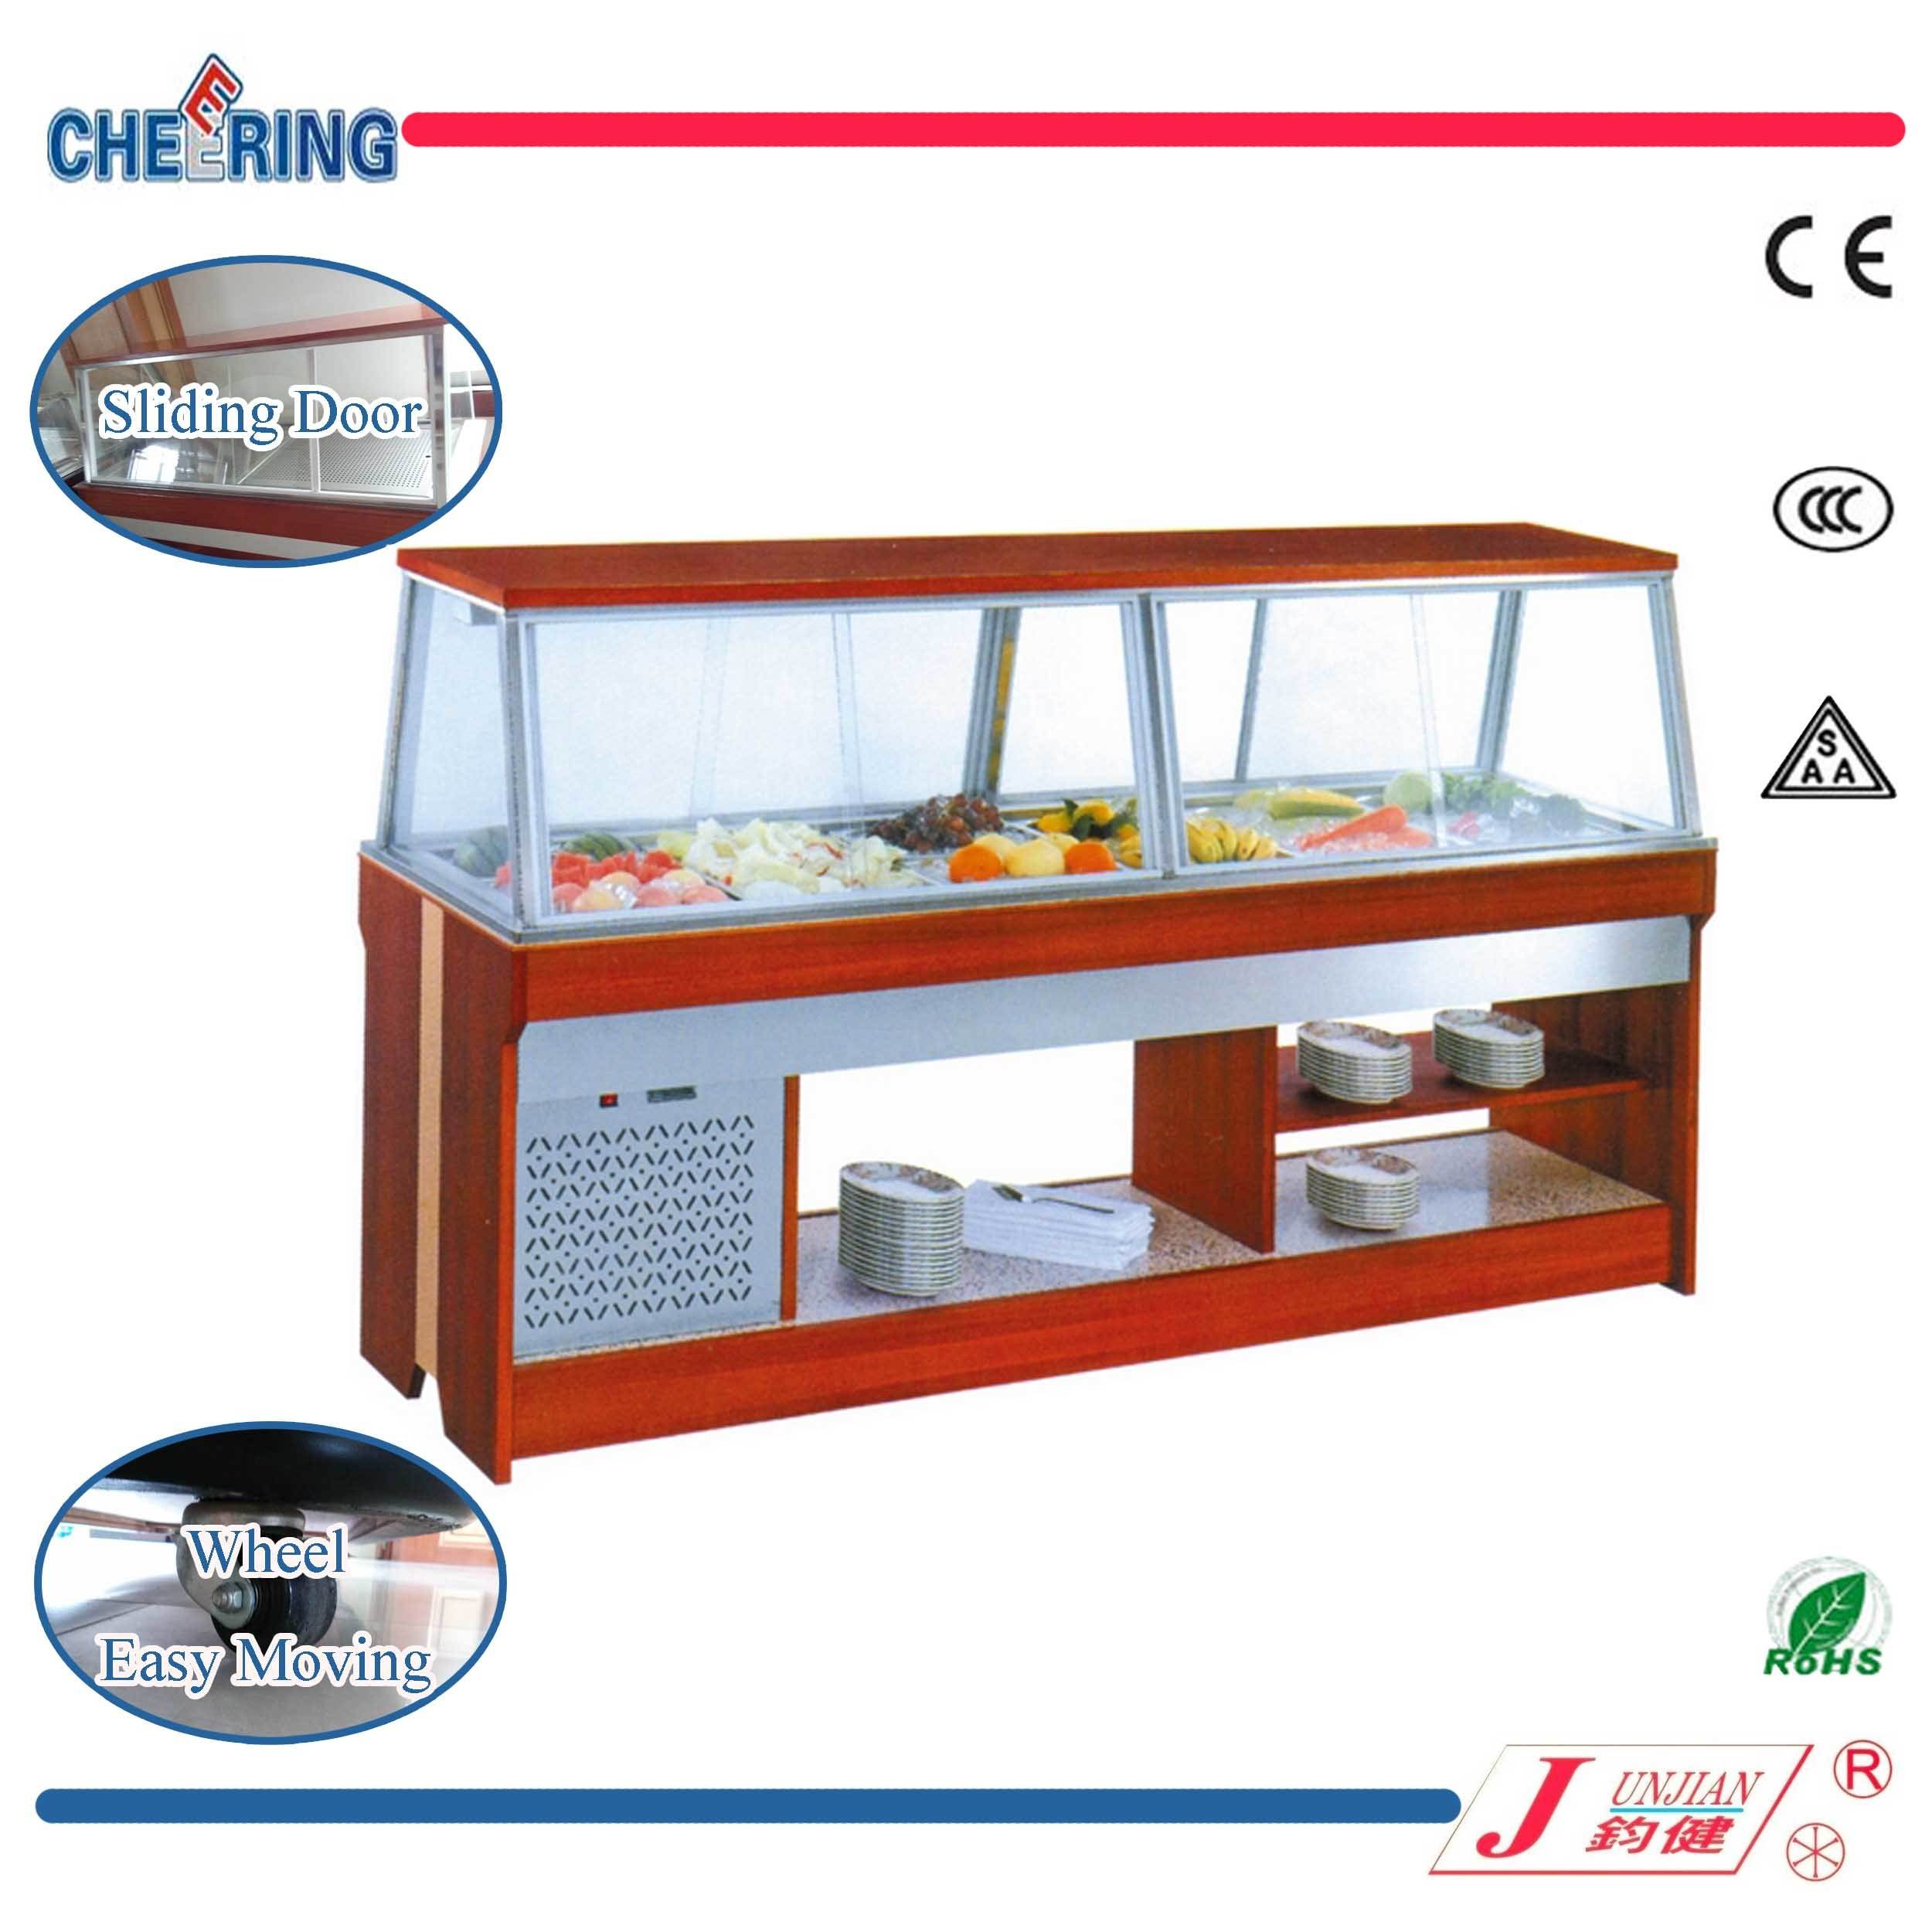 China Cheering Sliding-Door Fan Cooling Salad Bar Display